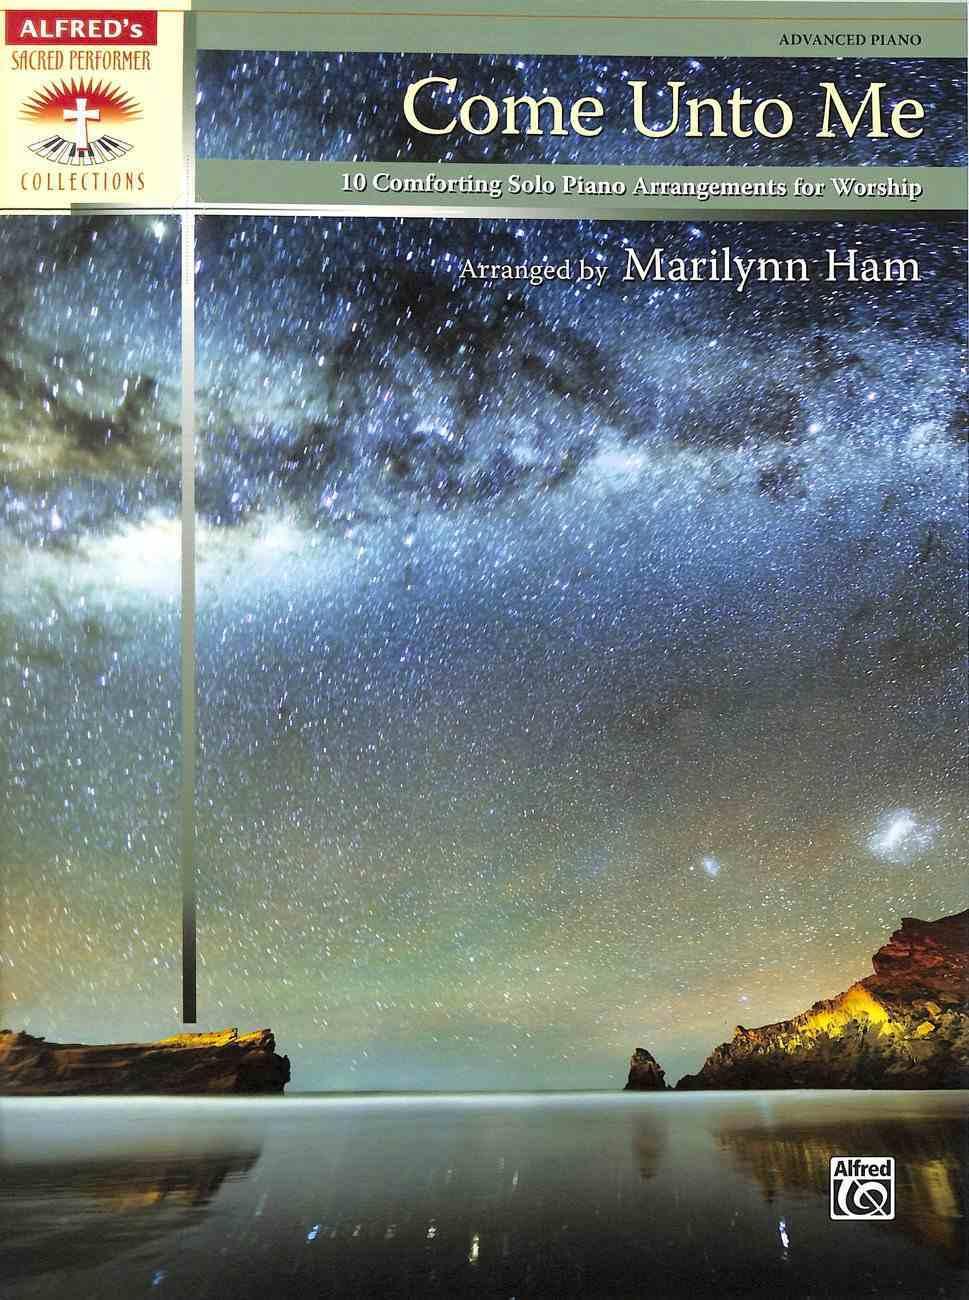 Come Unto Me: 10 Comforting Solo Piano Arrangements For Worship (Advanced Piano) (Music Book) Paperback